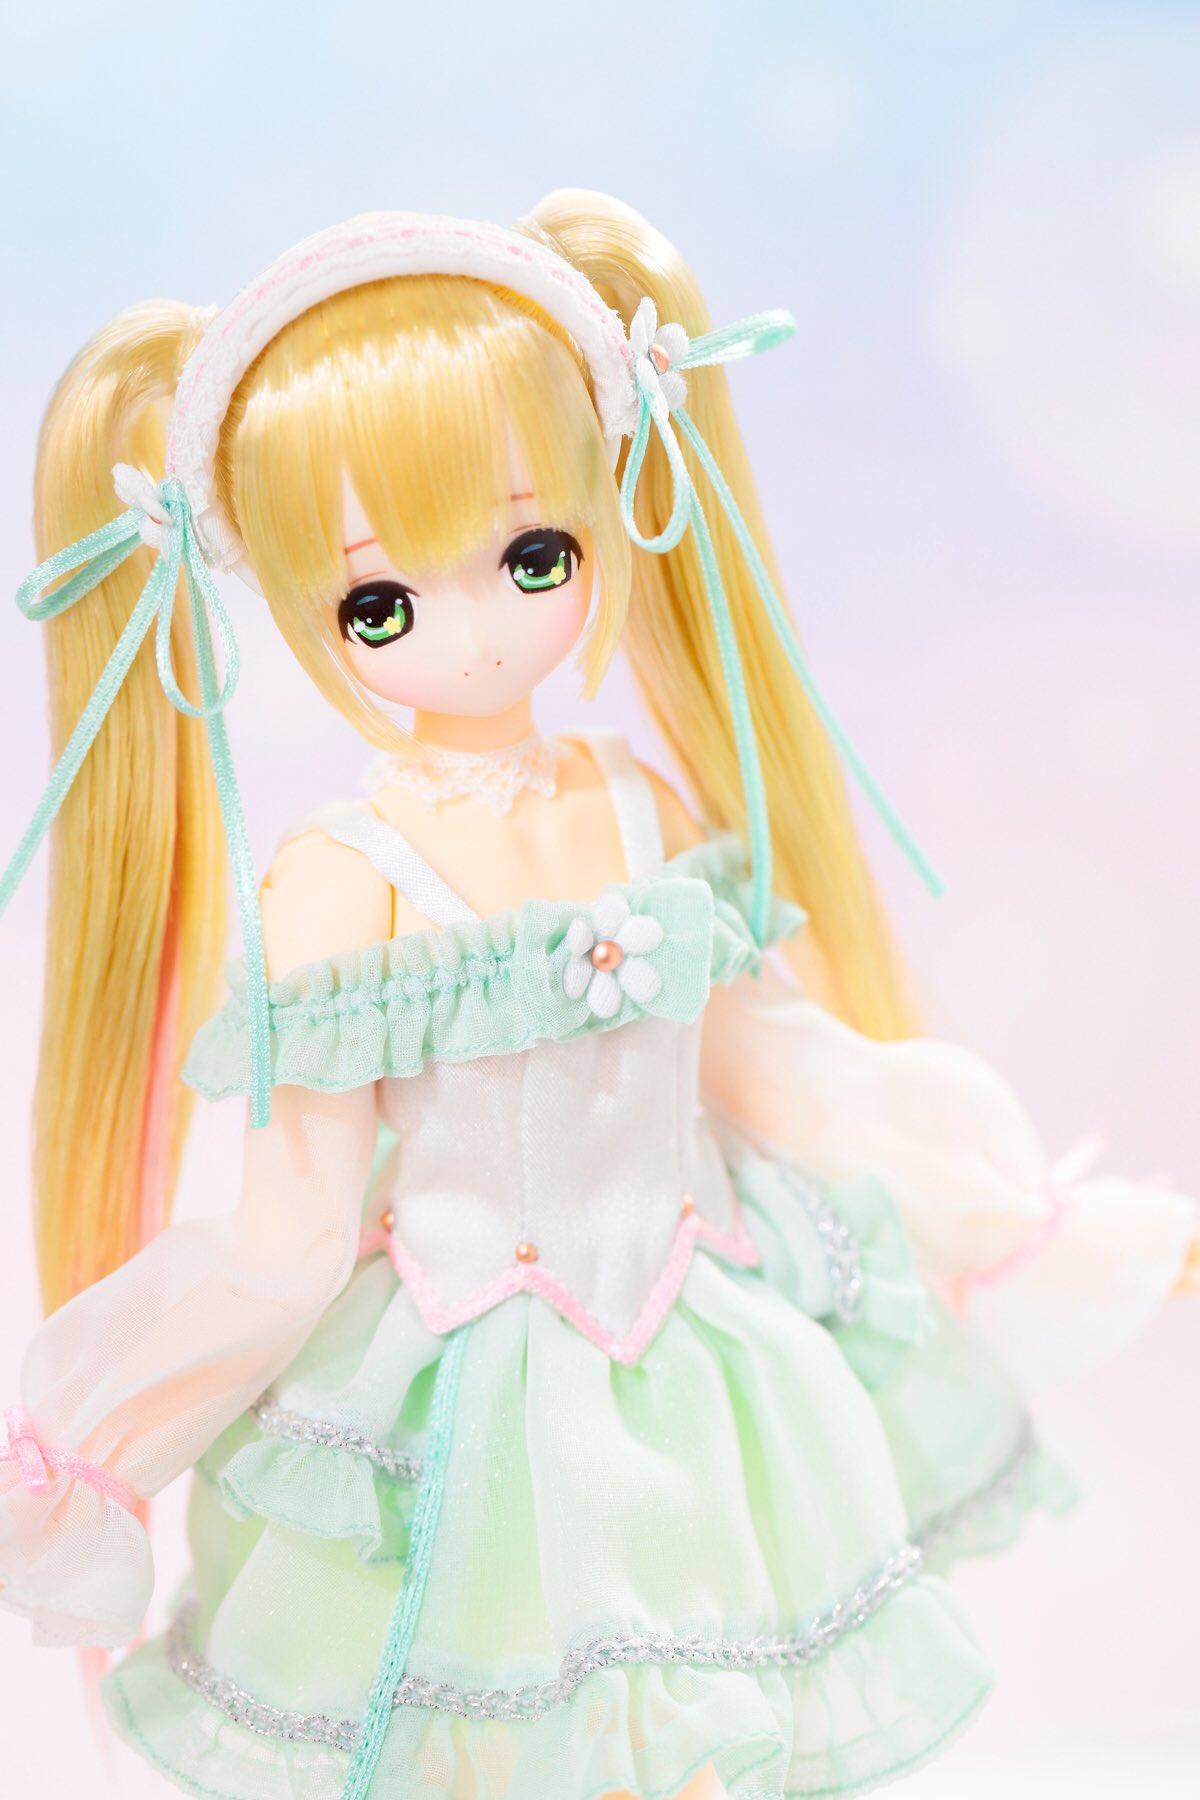 [Pure Neemo] Magical Cute Floral Ease - Miu Eaia-711